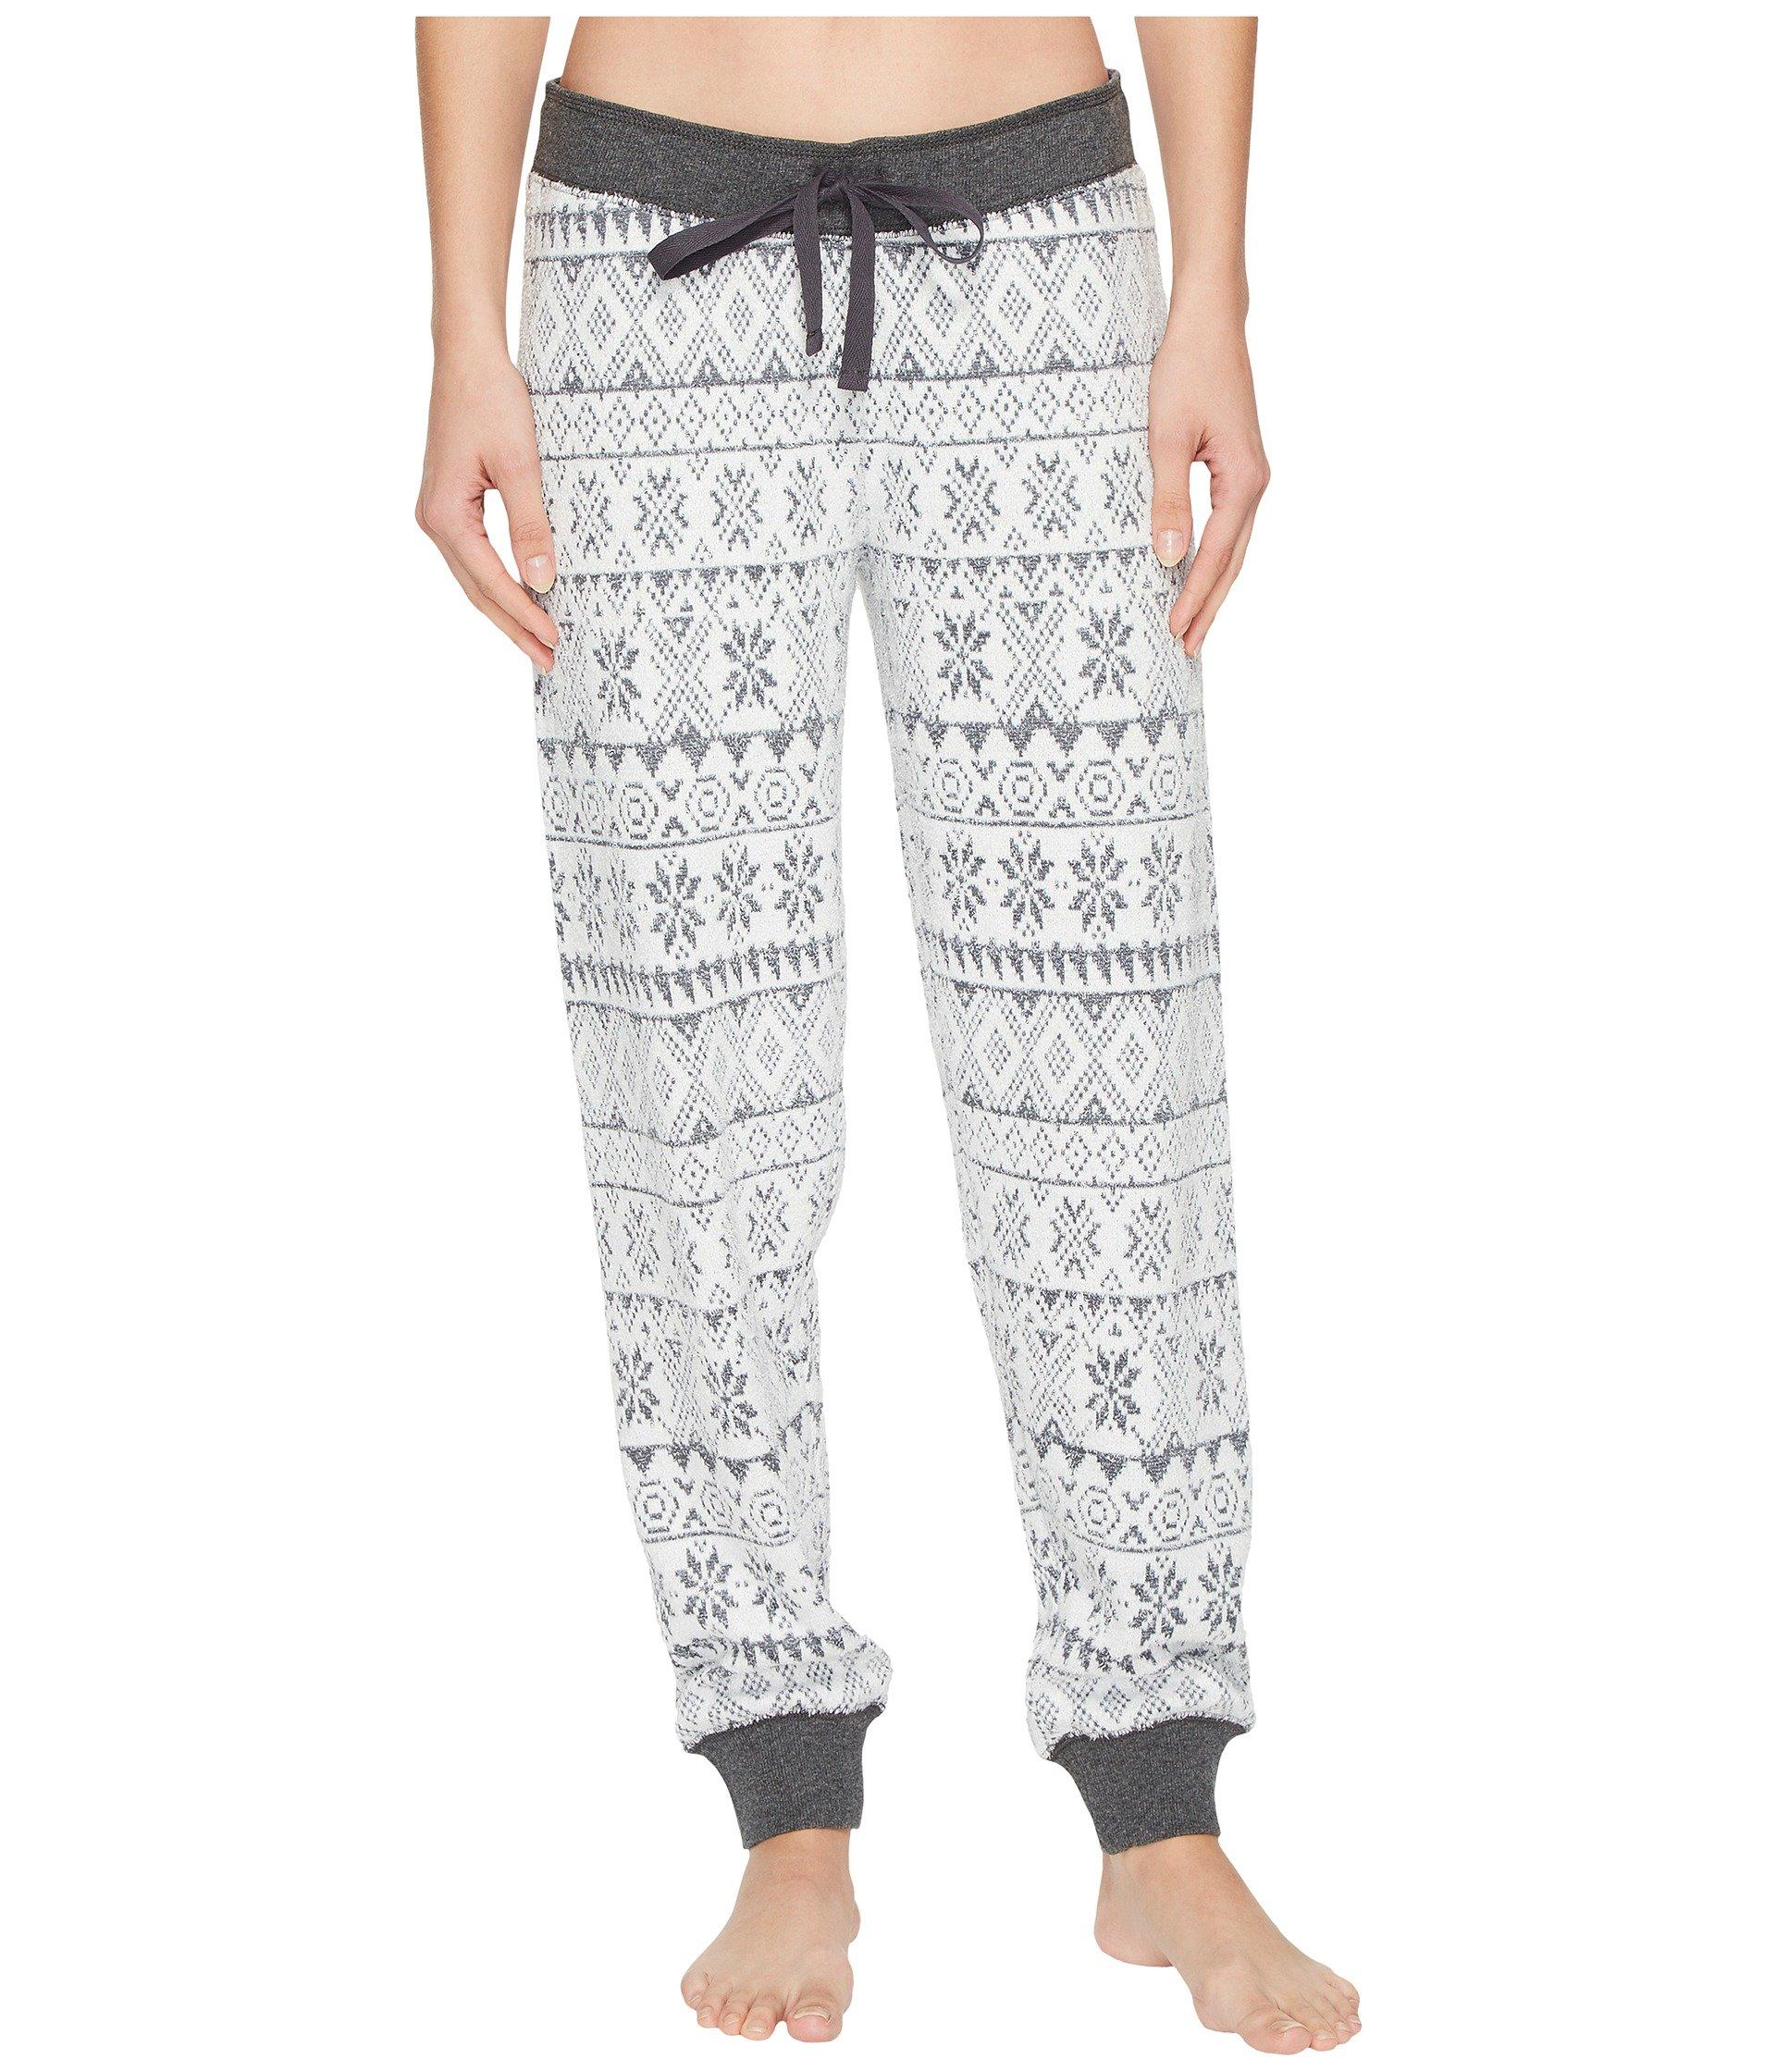 Pantalón de Pijama para Mujer P.J. Salvage Sleigh All Day Jogger  + P.J. Salvage en VeoyCompro.net